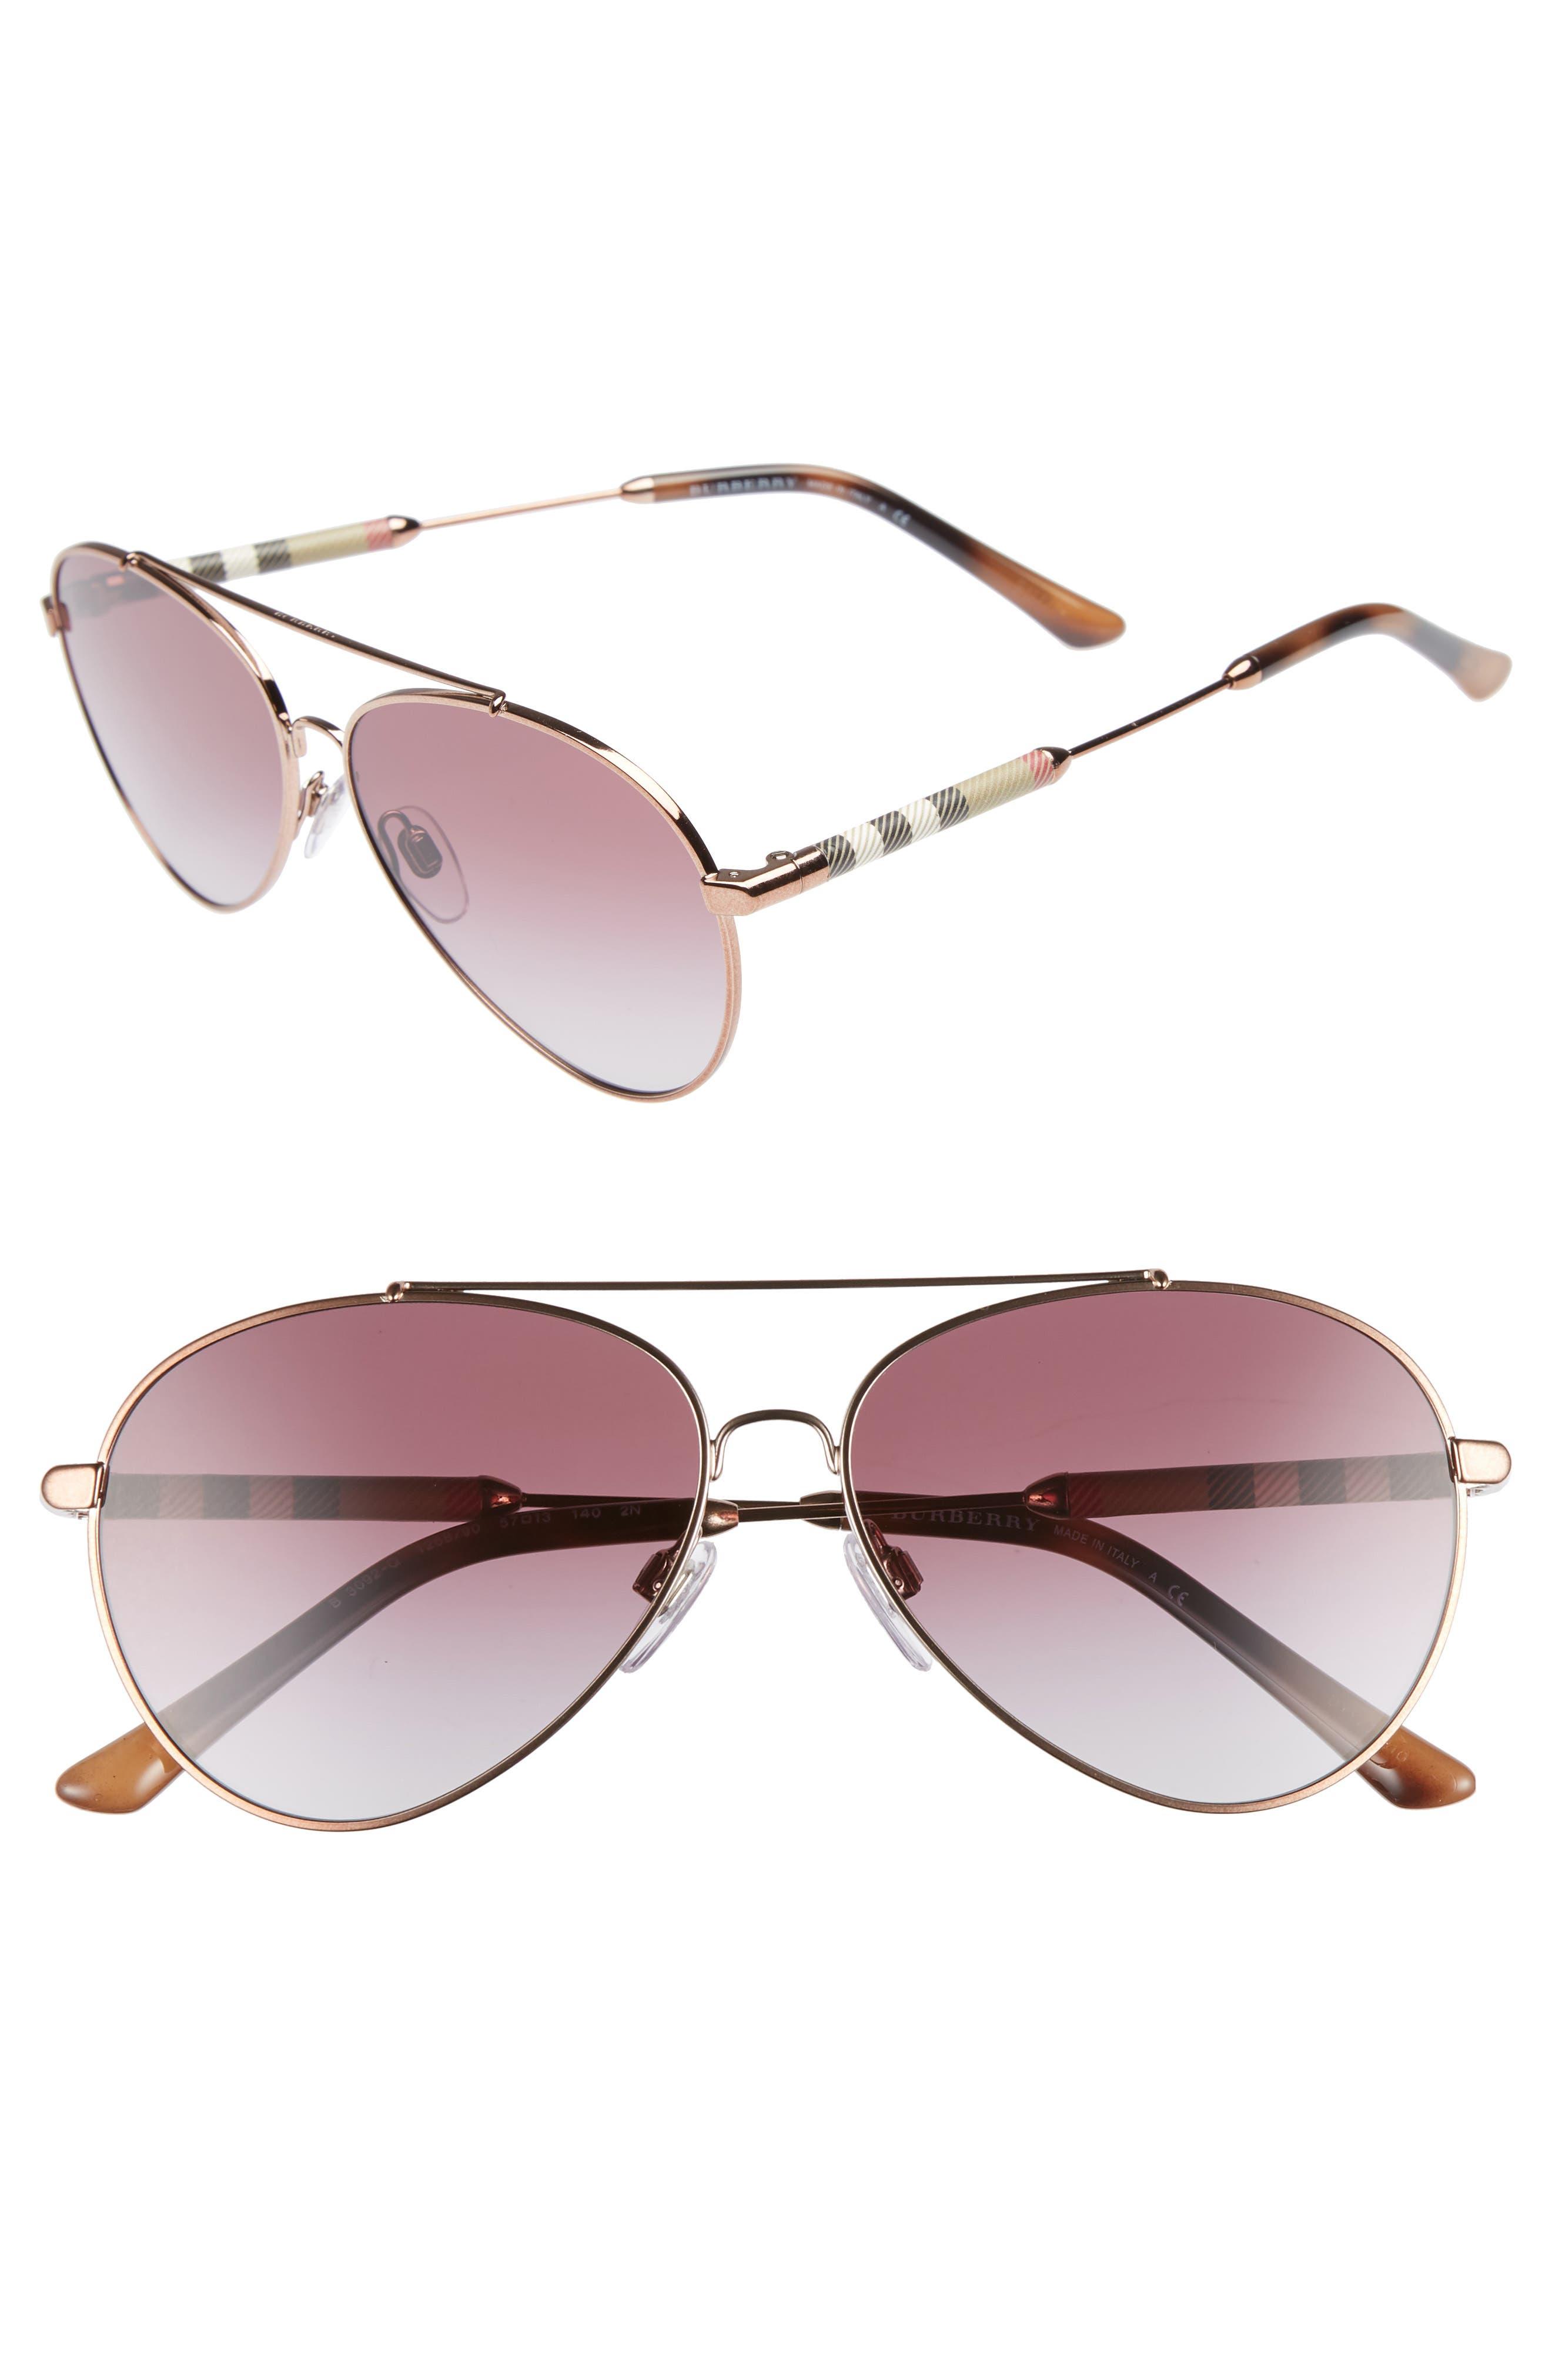 57mm Mirrored Aviator Sunglasses,                             Main thumbnail 1, color,                             VIOLET GRADIENT